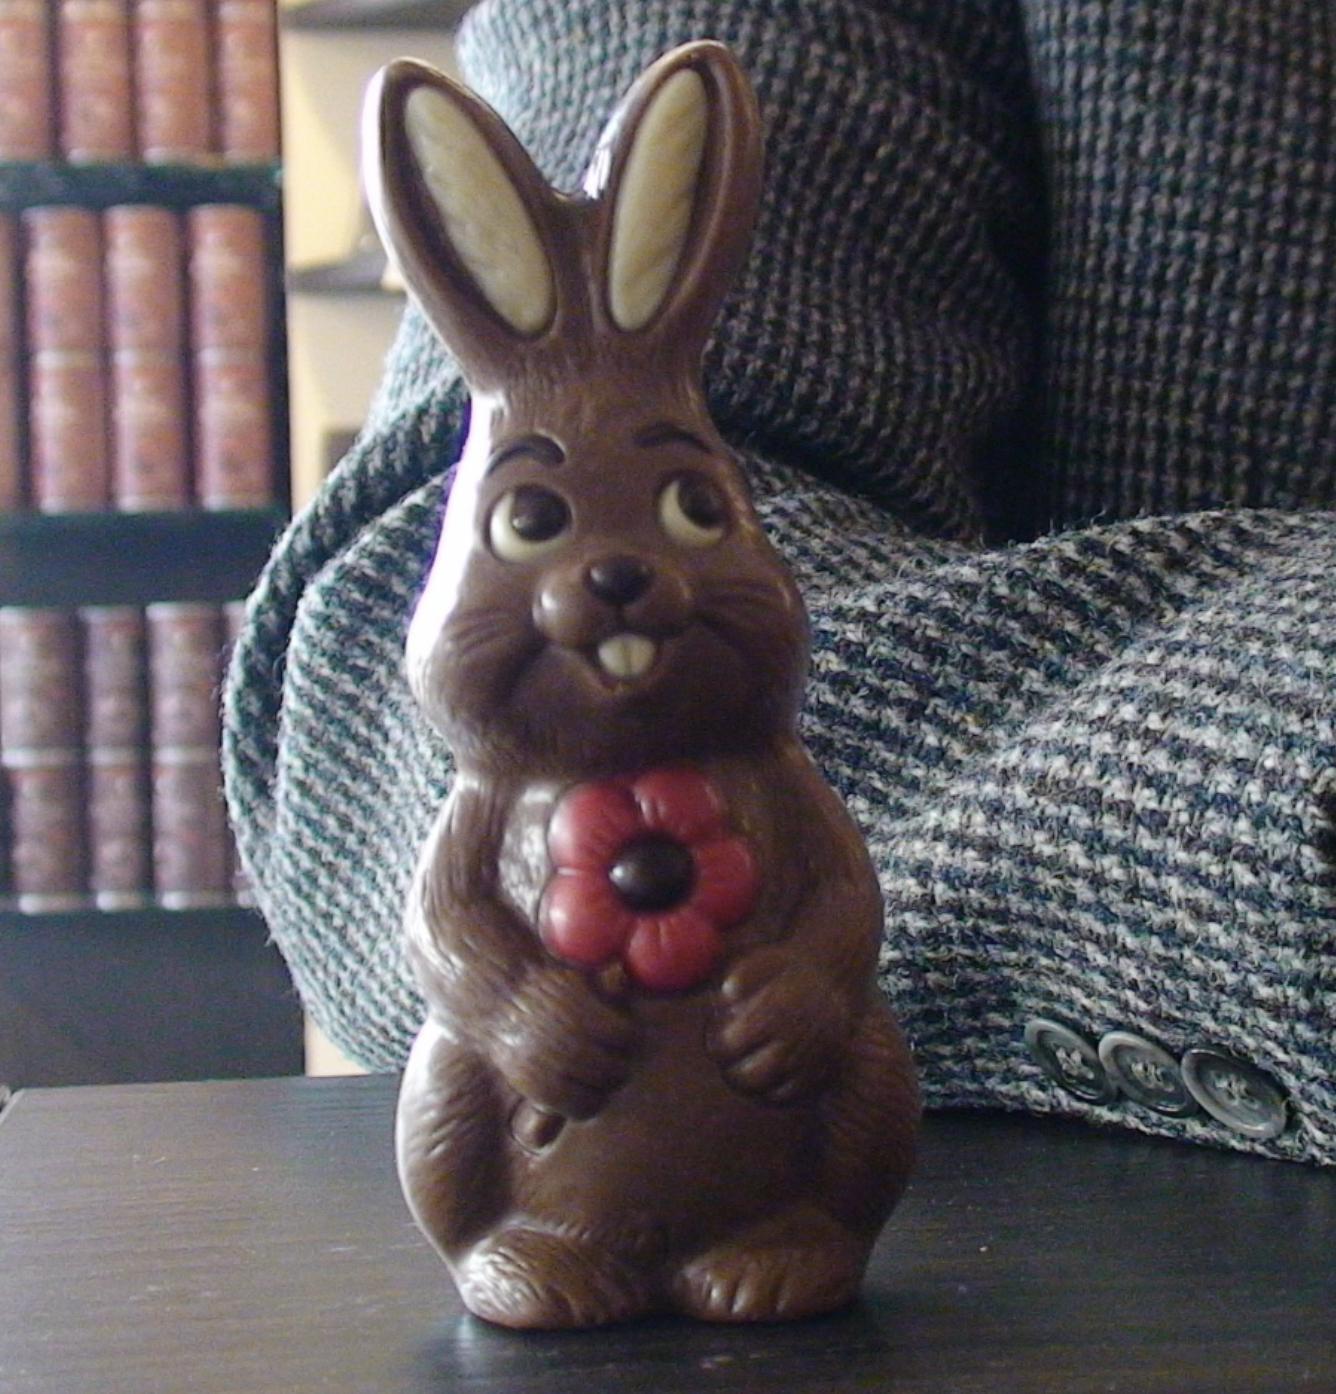 Günther the Bunny